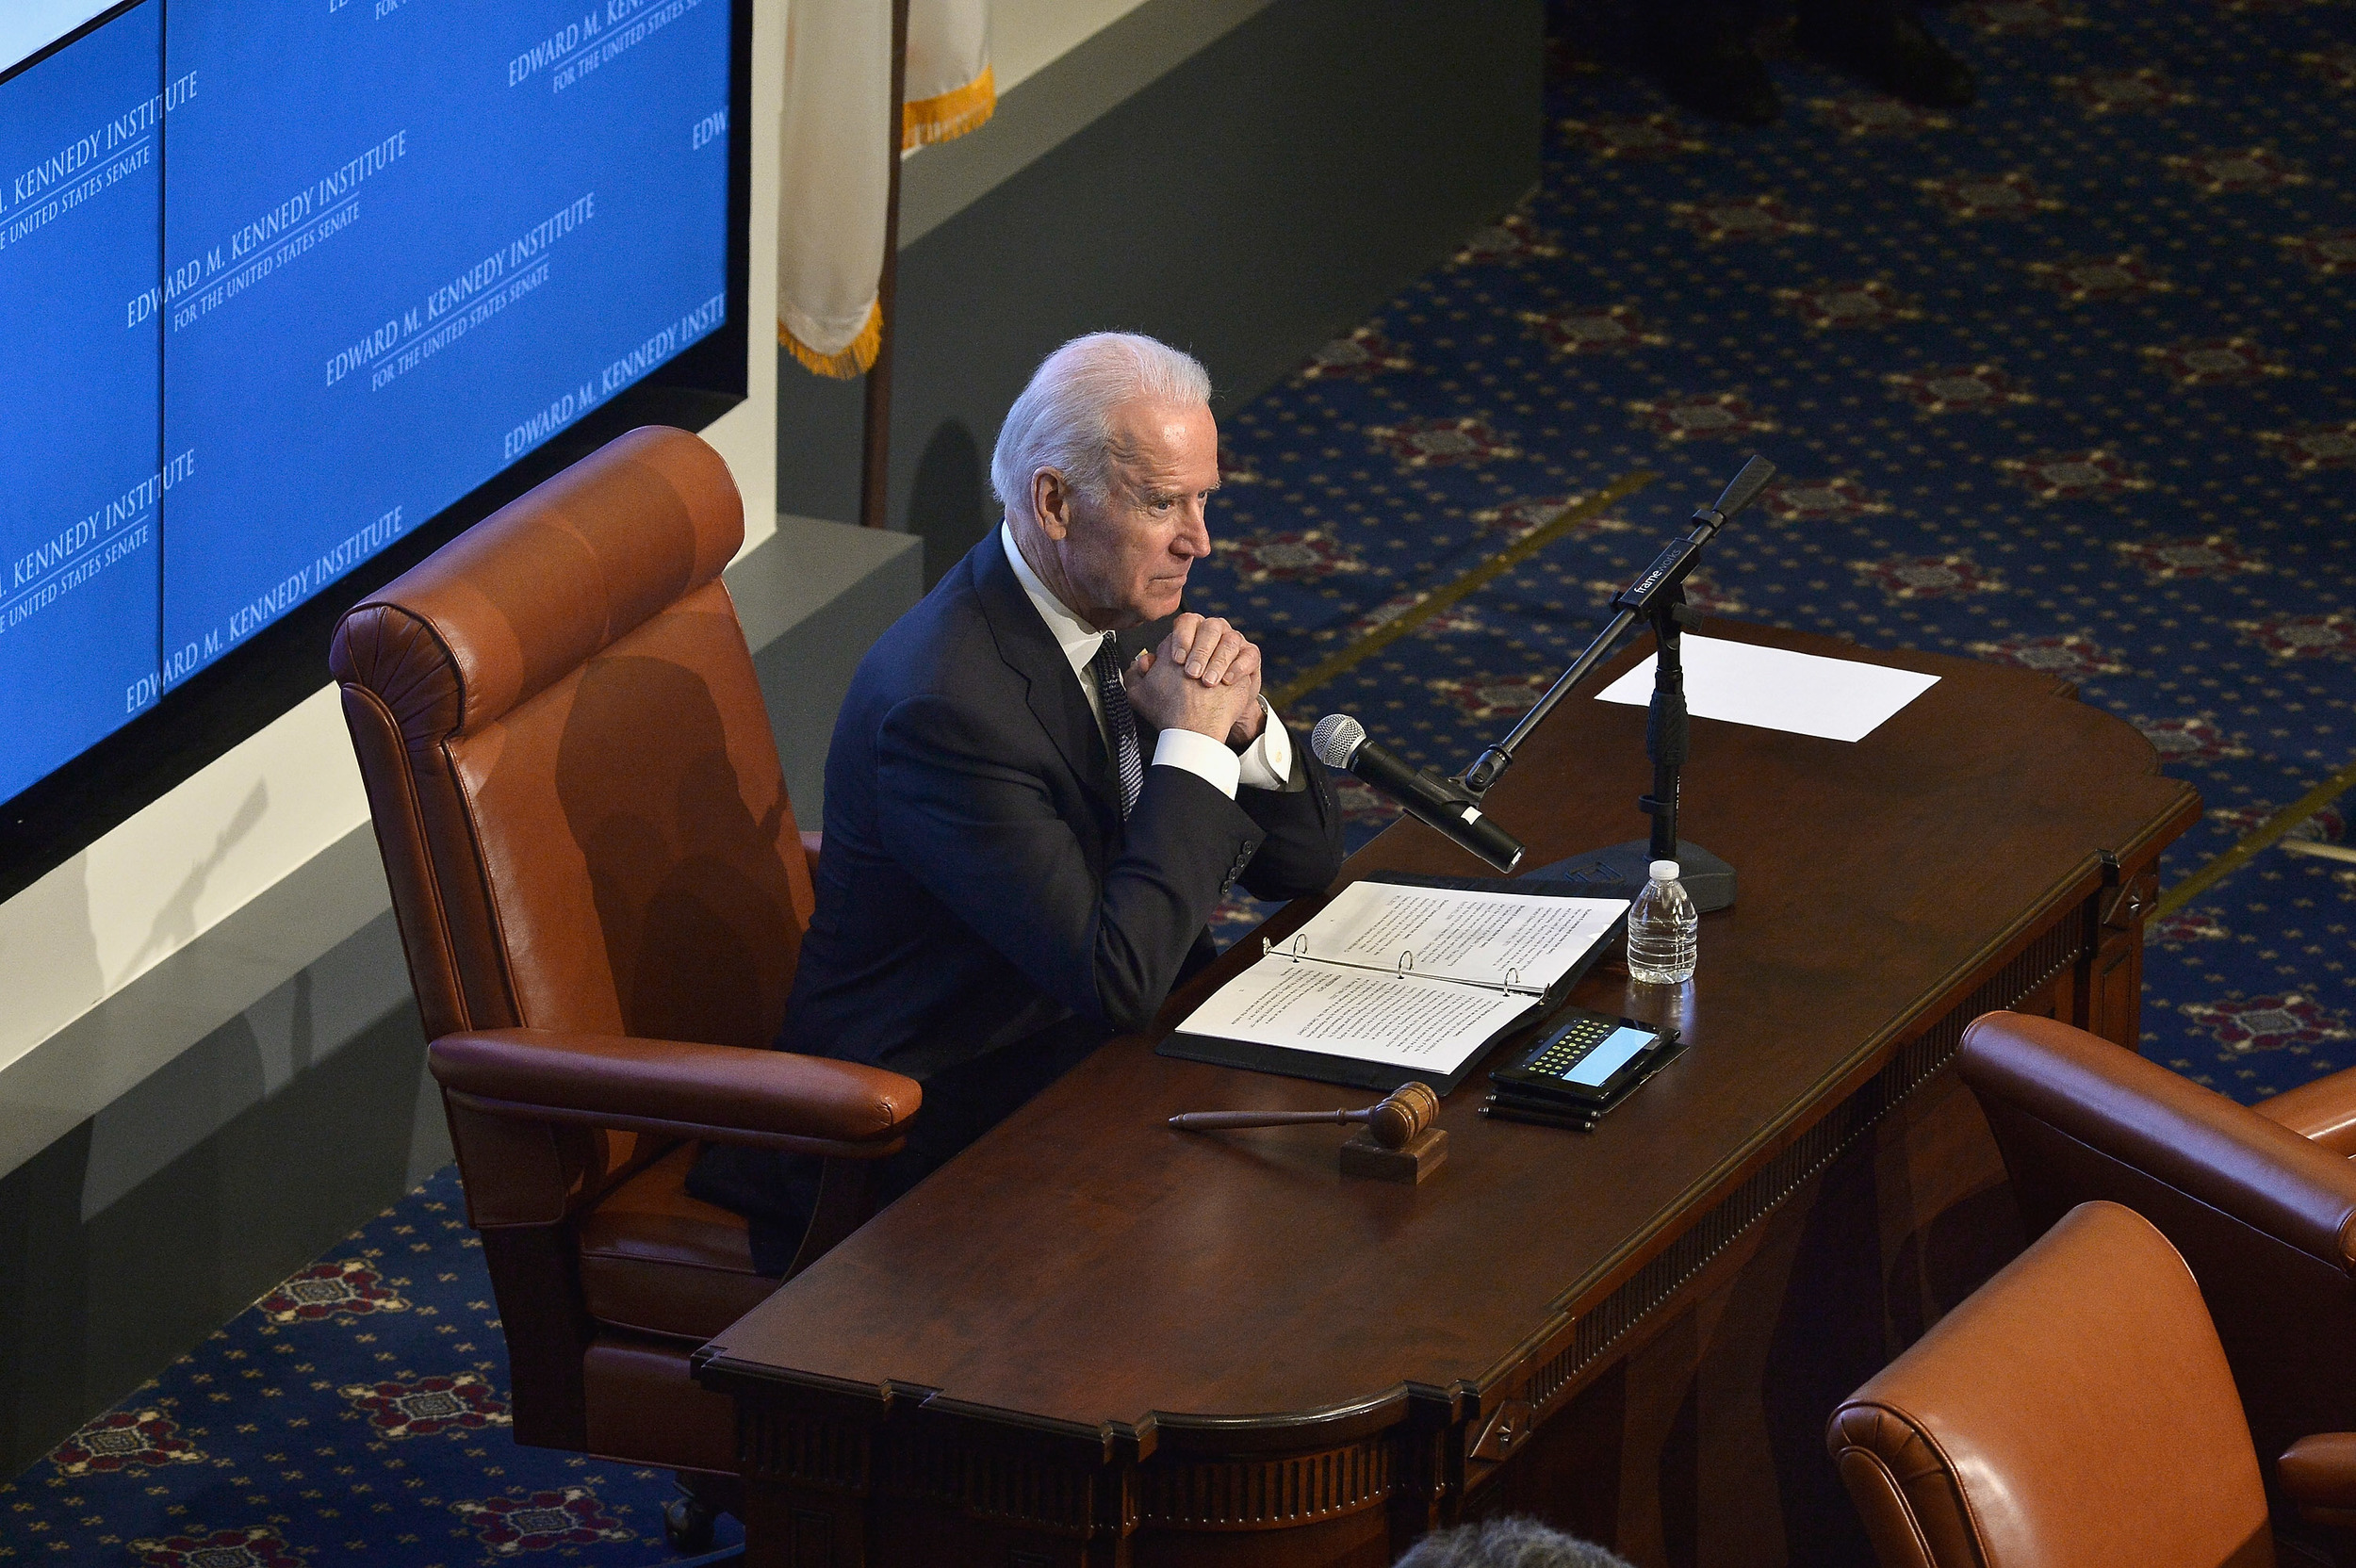 Vice President Joe Biden at Ted Kennedy Institute